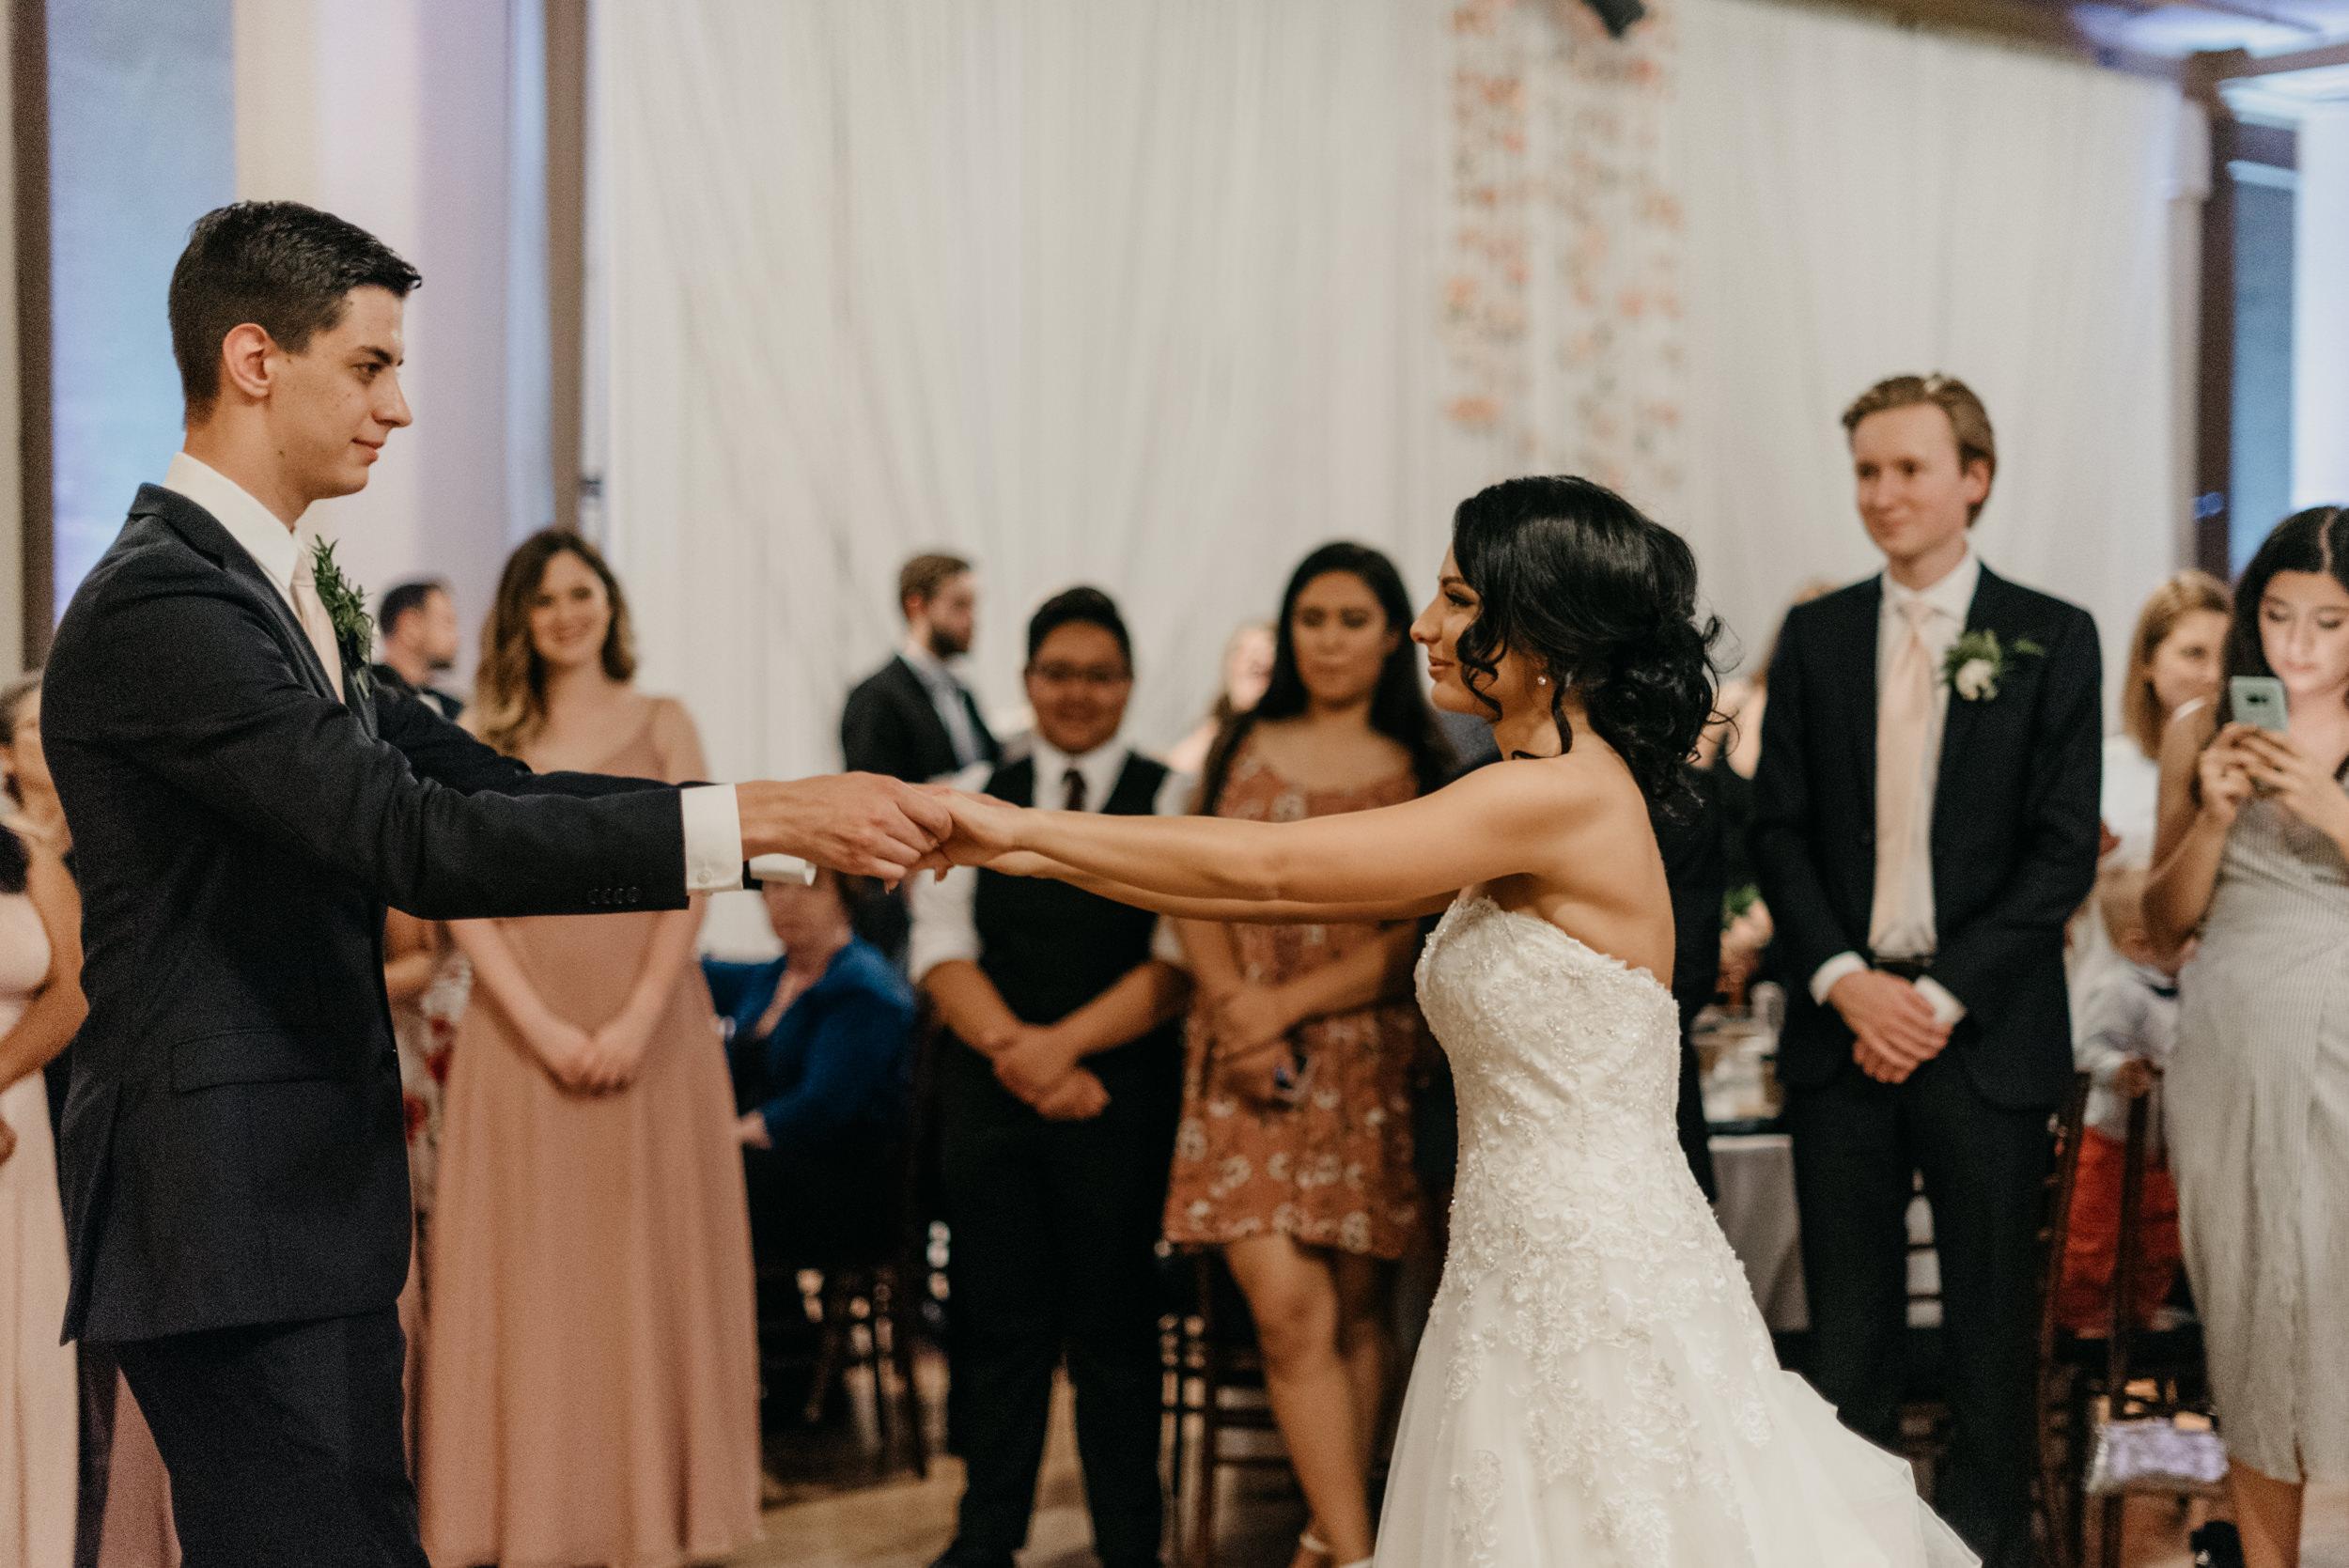 117-reception-west-end-ballroom-portland-wedding-photographer-9754.jpg